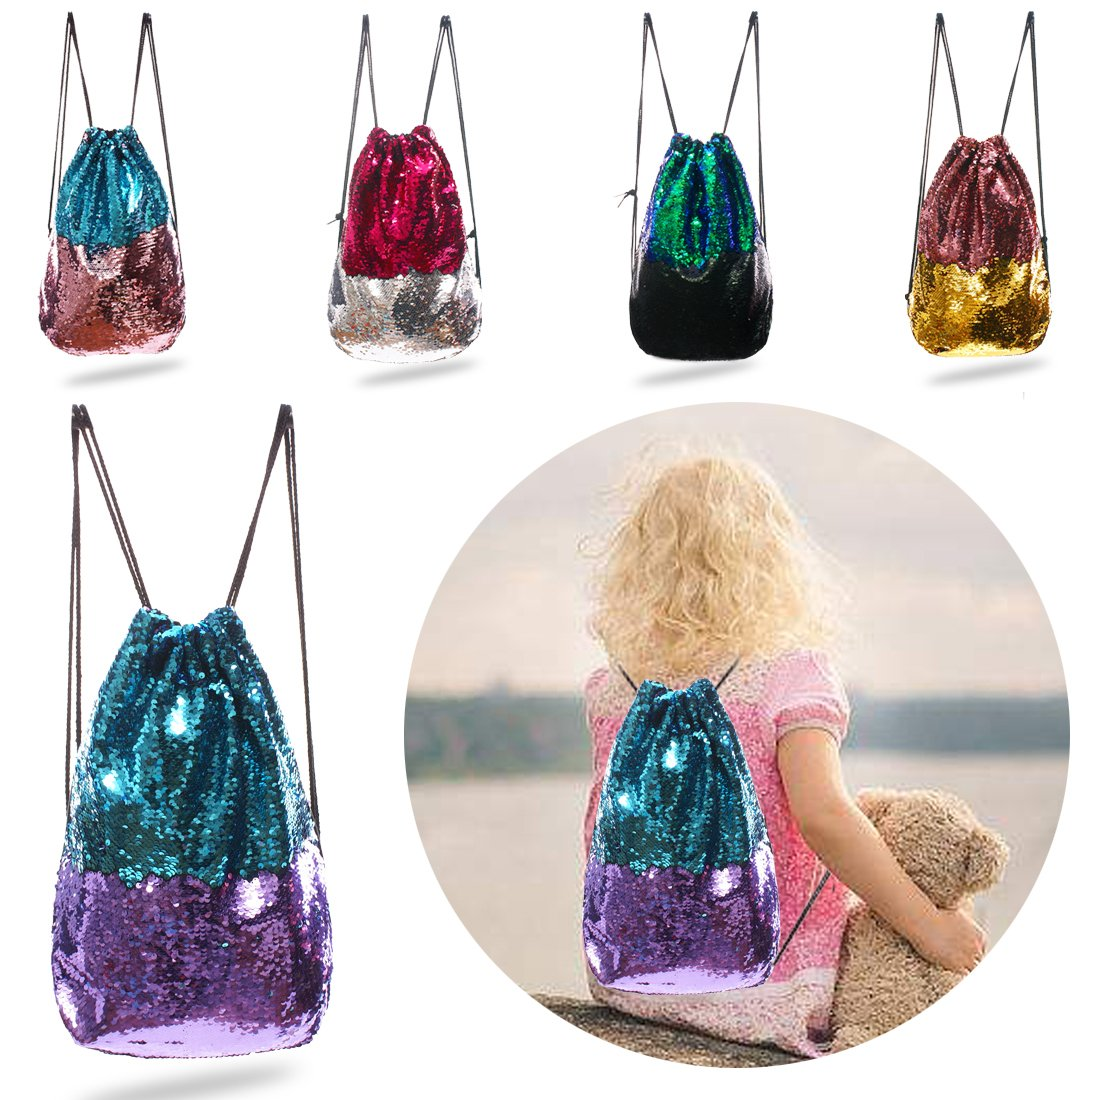 Magic Mermaid Reversible Sequin Adjustable Drawstring Backpack/Bag with Soft Velvet Backside&Pocket Inside; Stainless Strap Cap Blue/Purple for Kids Girls Adult Women; Perfect Gift Idea